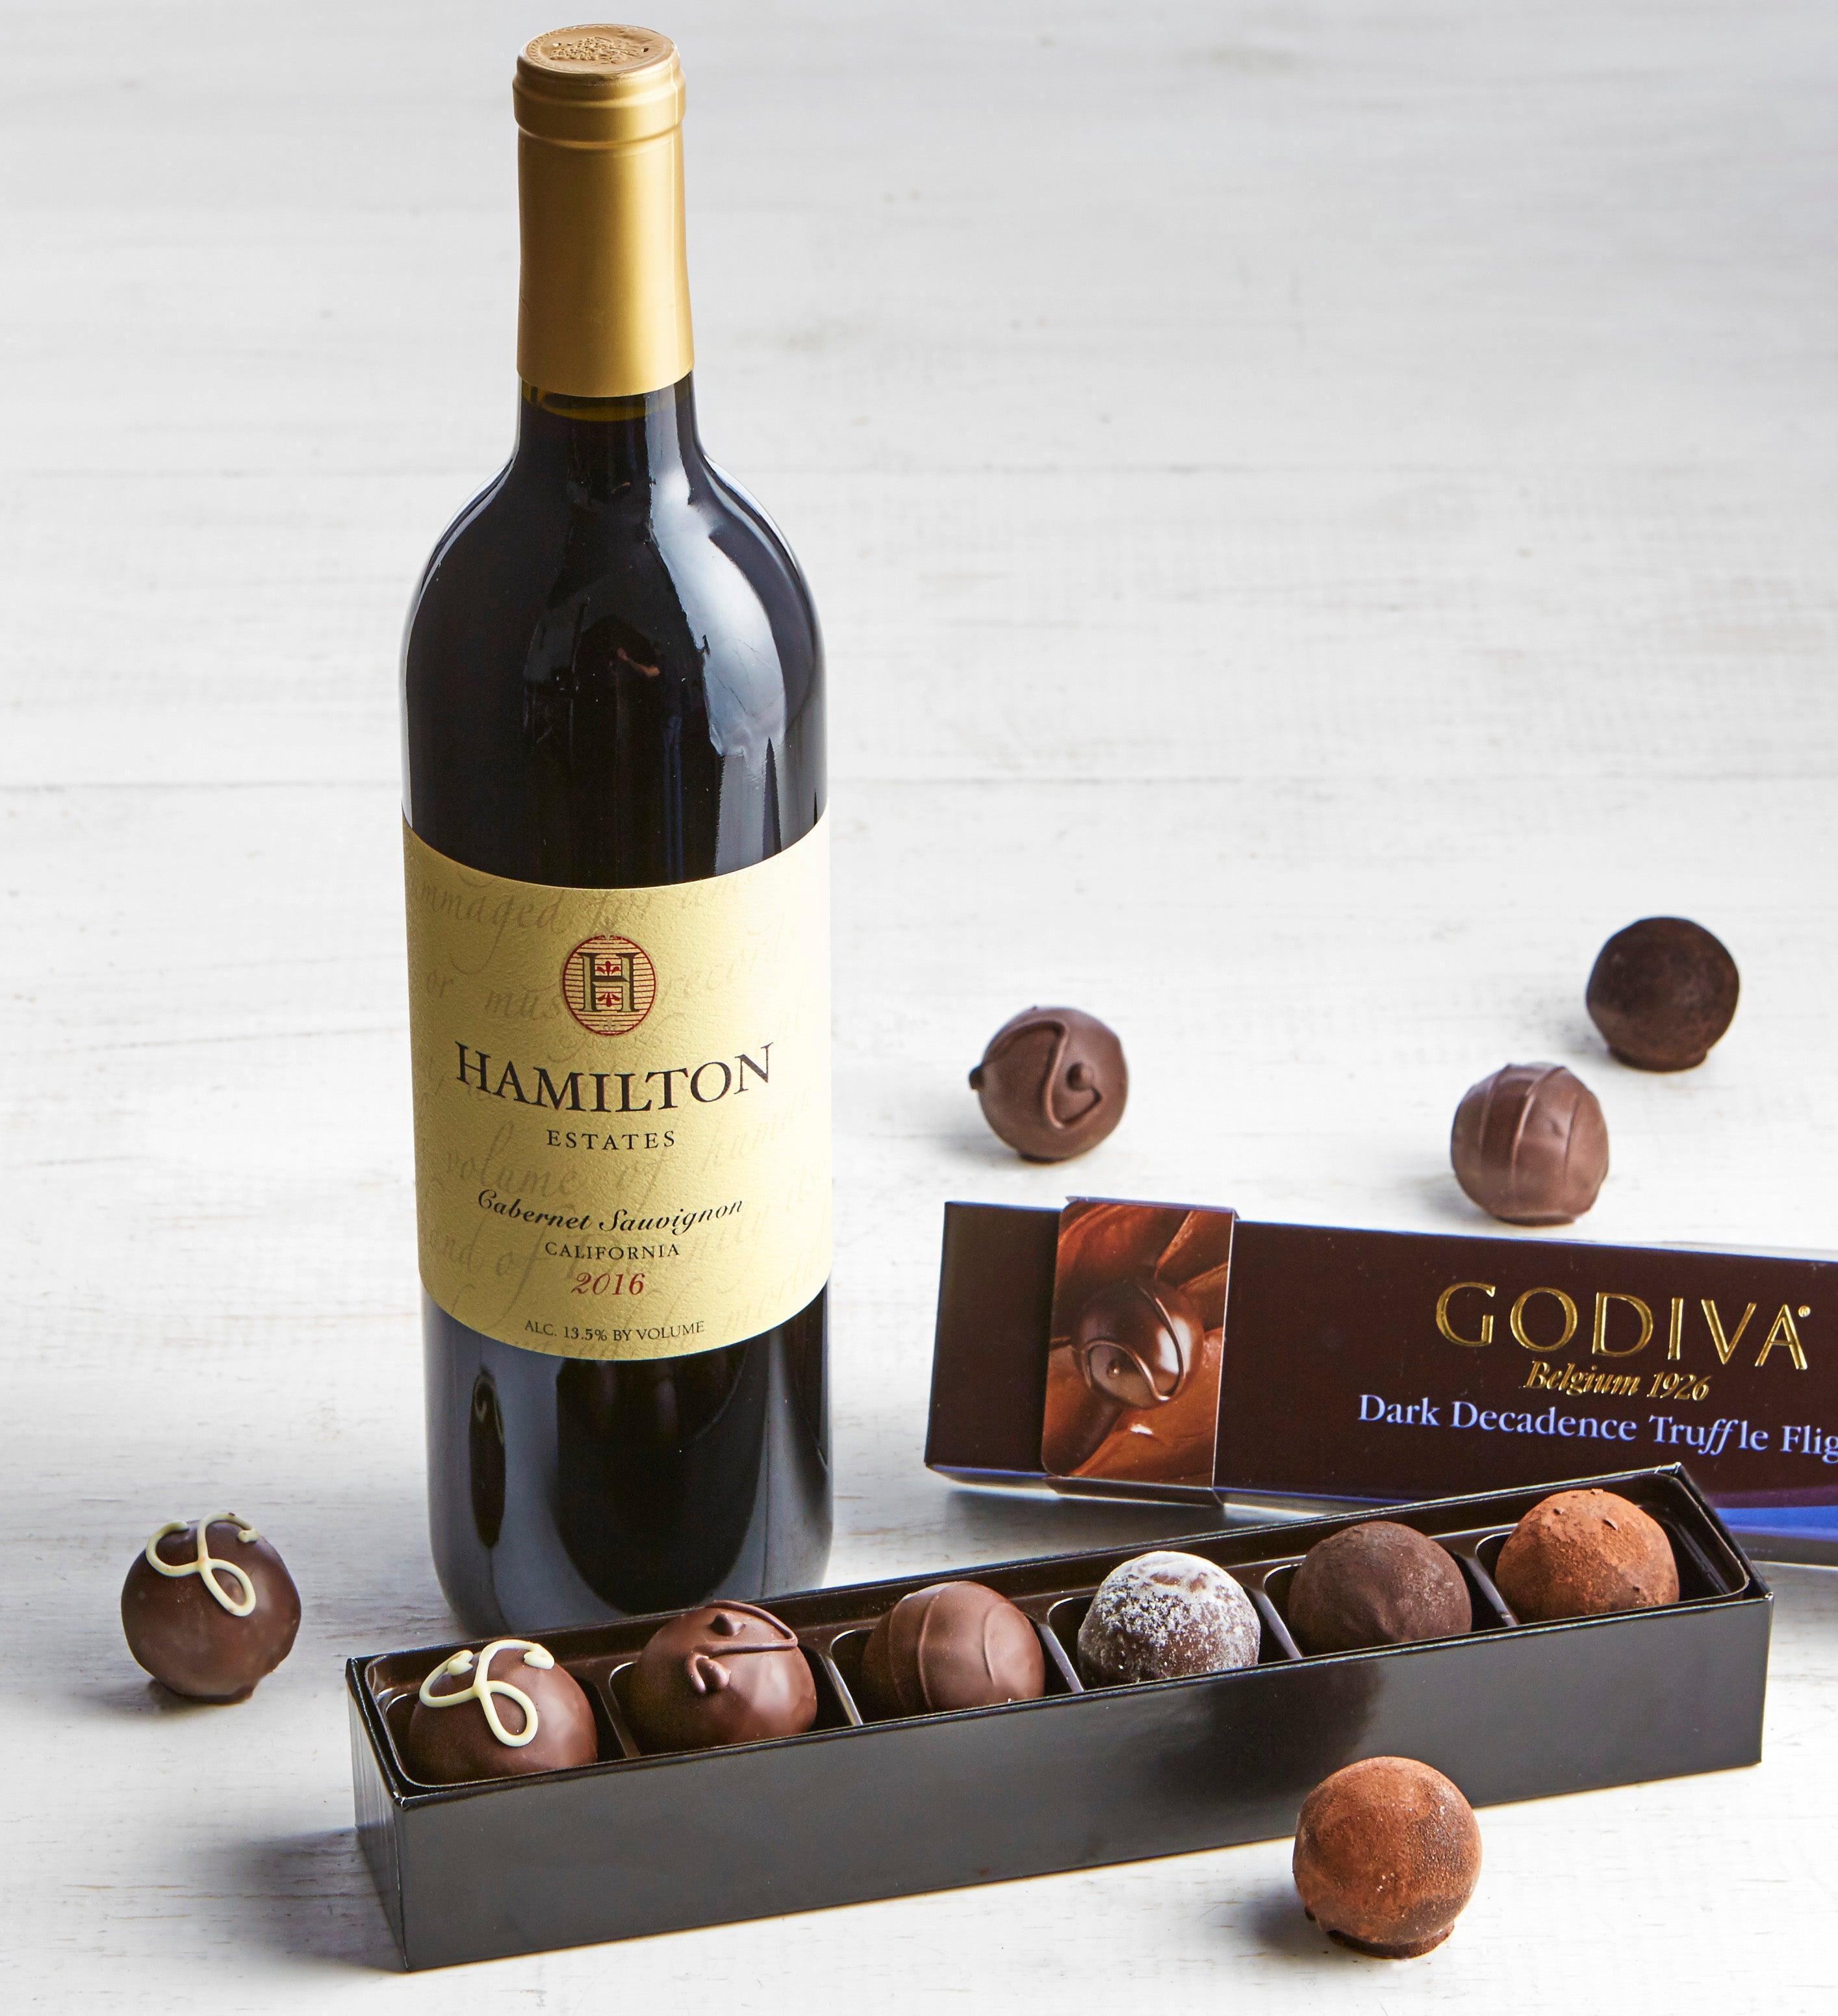 Godiva Dark Decadence Truffle Flight Box & Wine